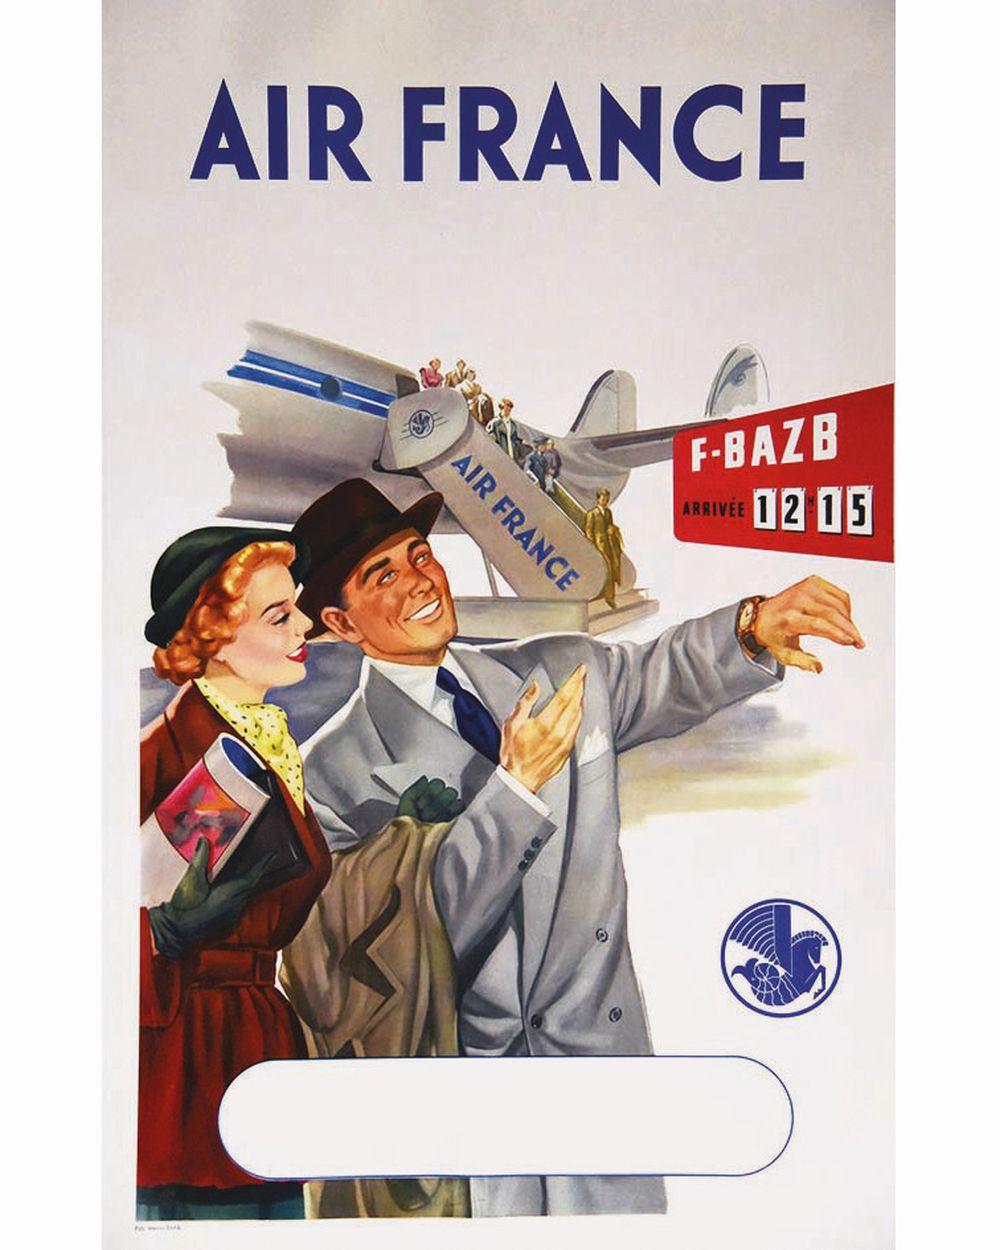 EILFA MARCO - Air France F BazrB 12: 15 ( Couple )     vers 1950